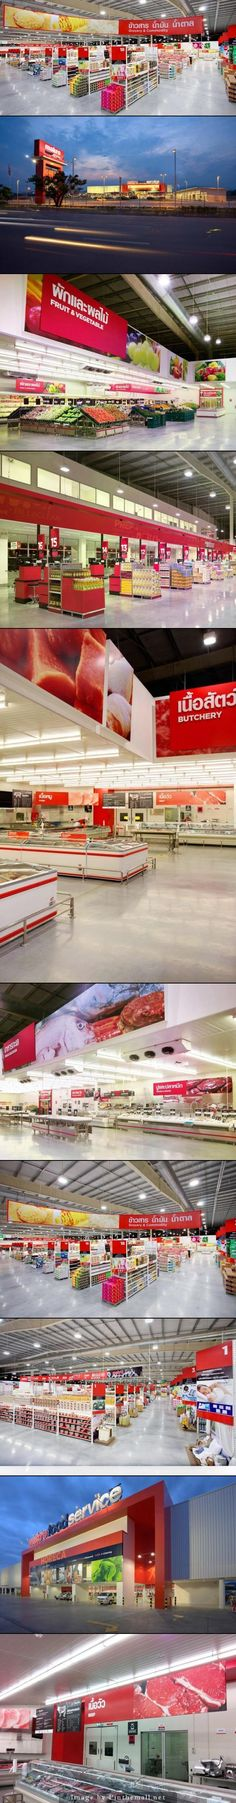 makro food service, hua hin, prachuap khiri khan - created on 2014-09-14 12:41:10